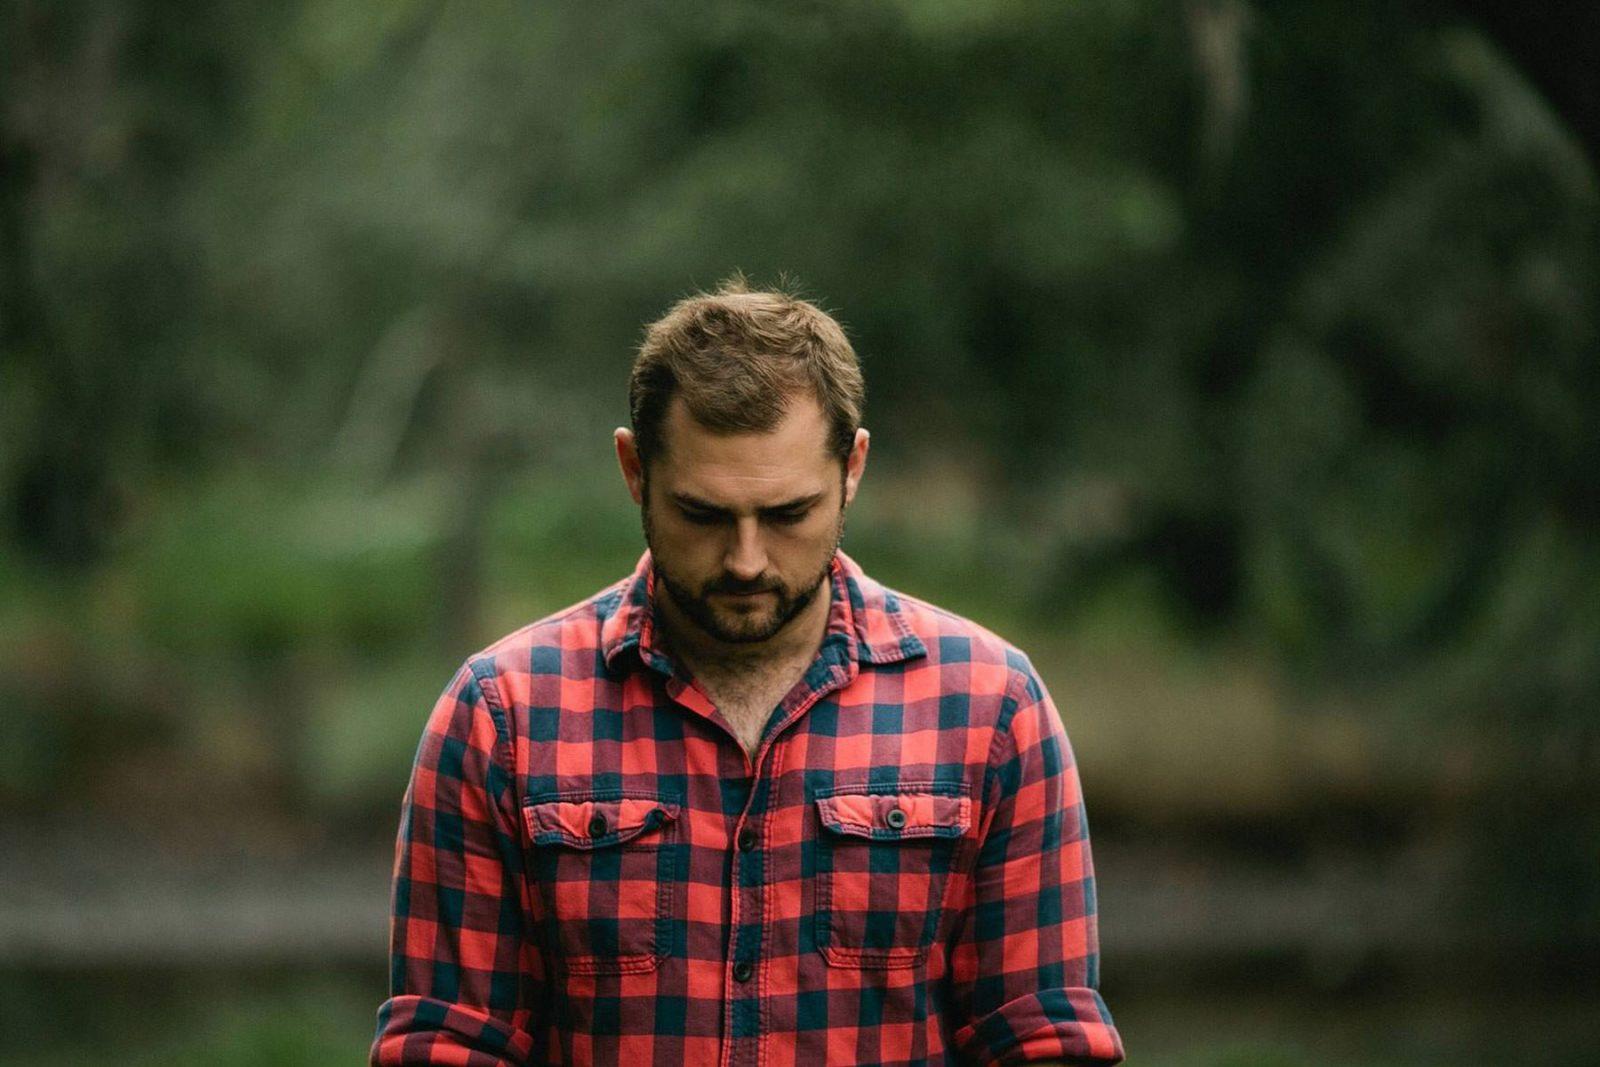 Man walking looking dejected